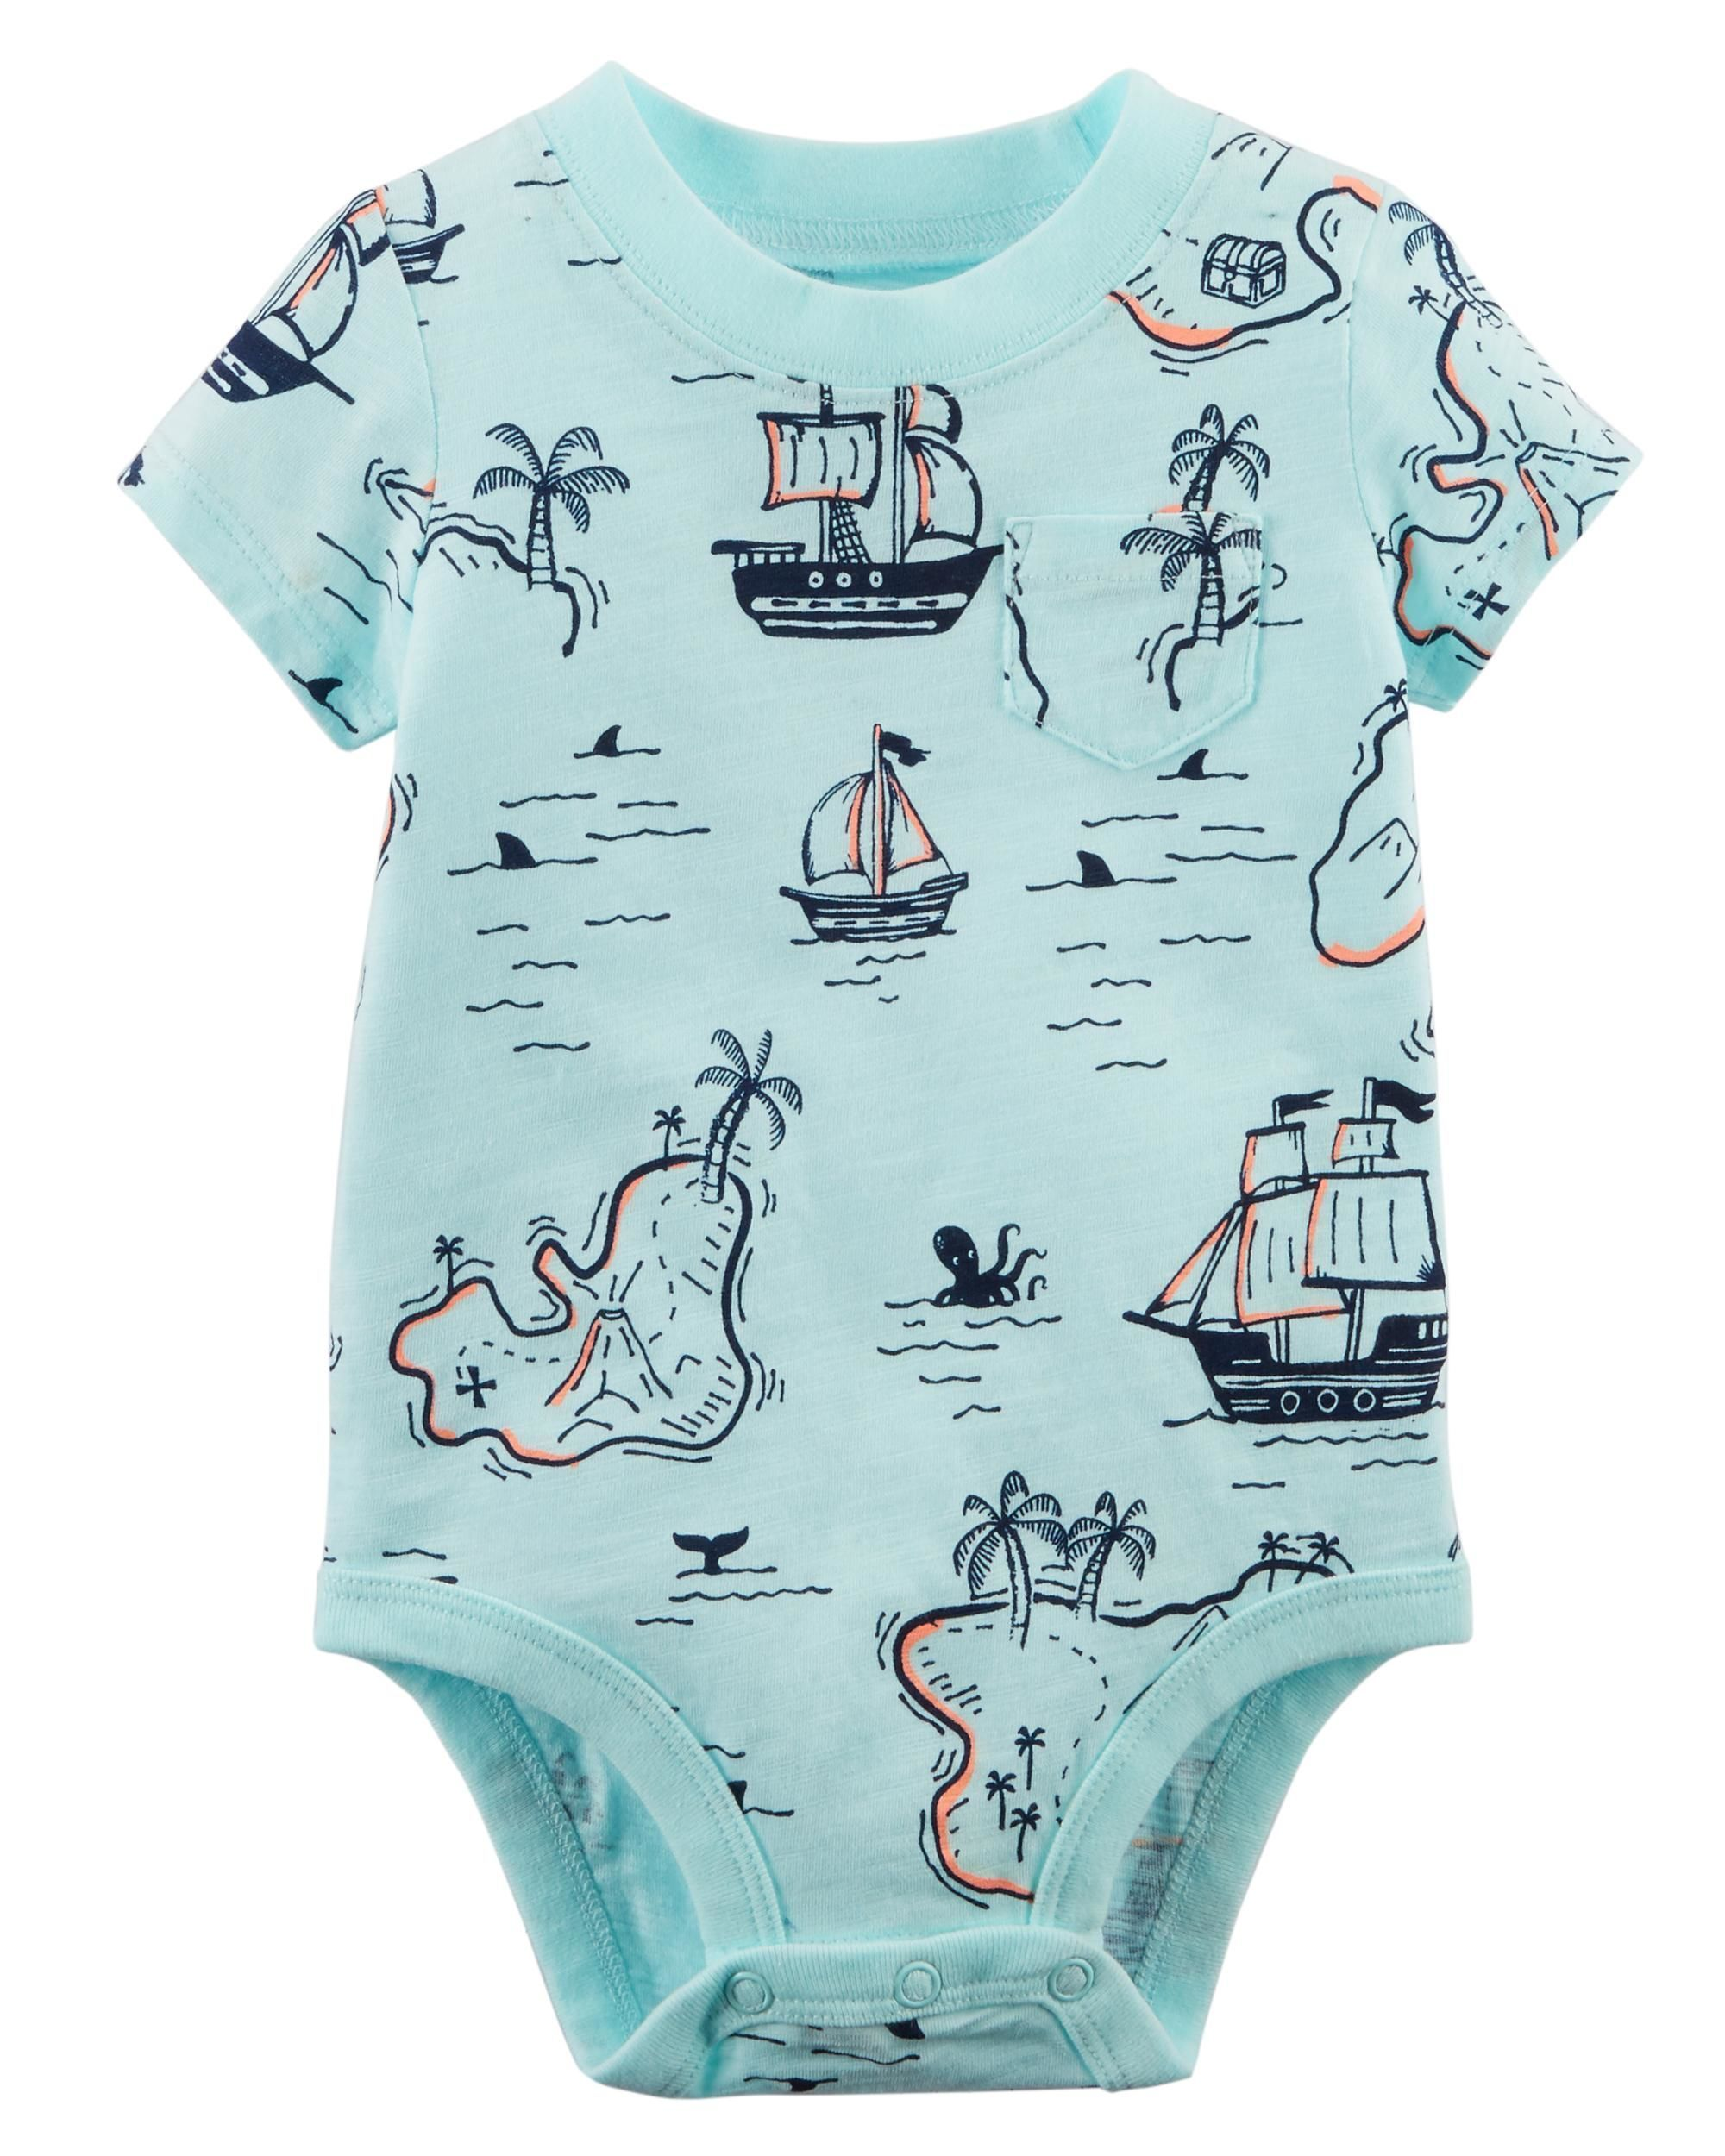 45bfbb2ce Baby Boy Pirate Map Bodysuit